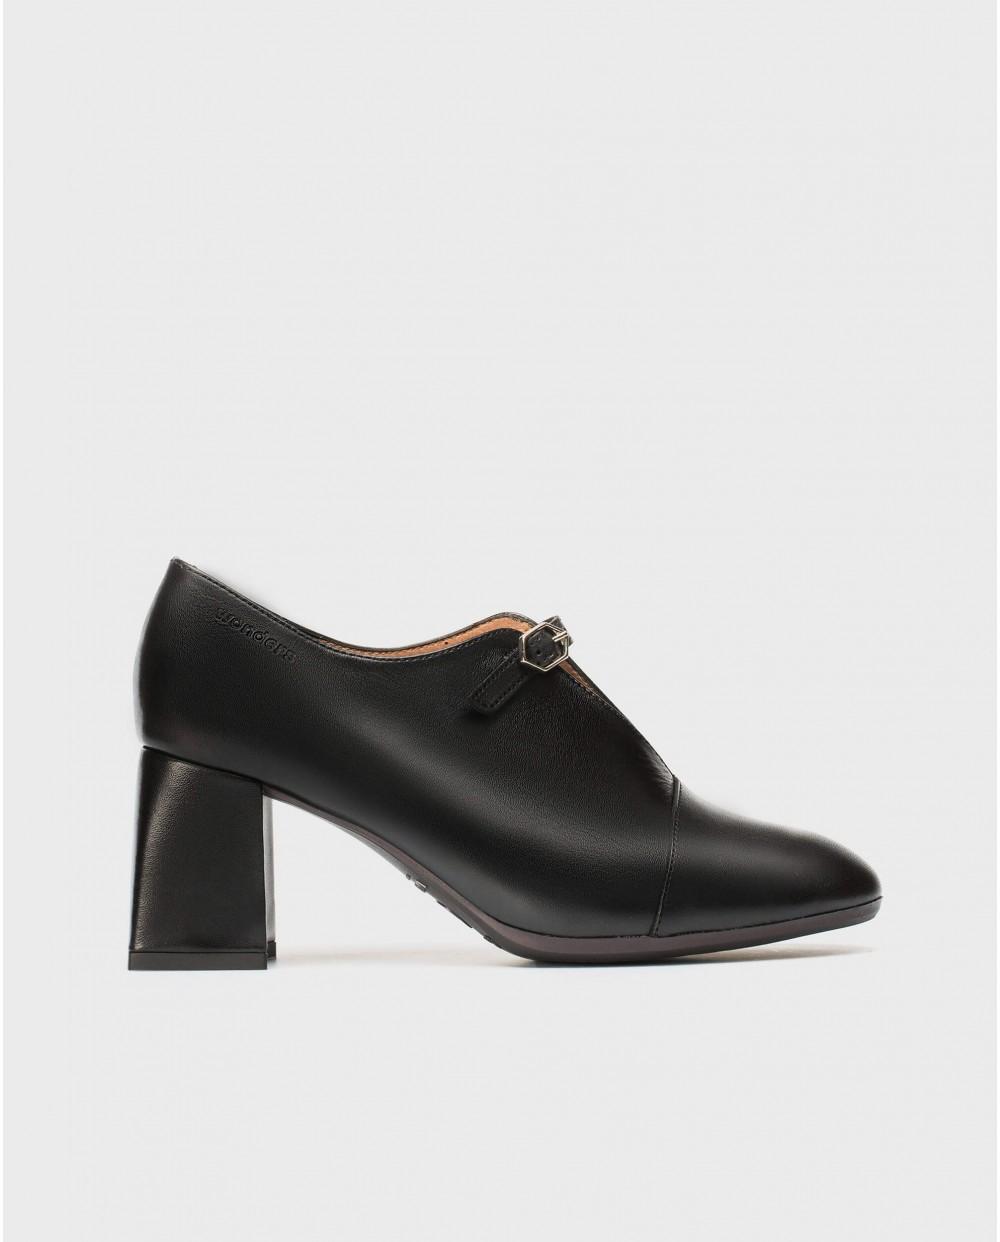 Wonders-Heels-High heeled shoe with buckle